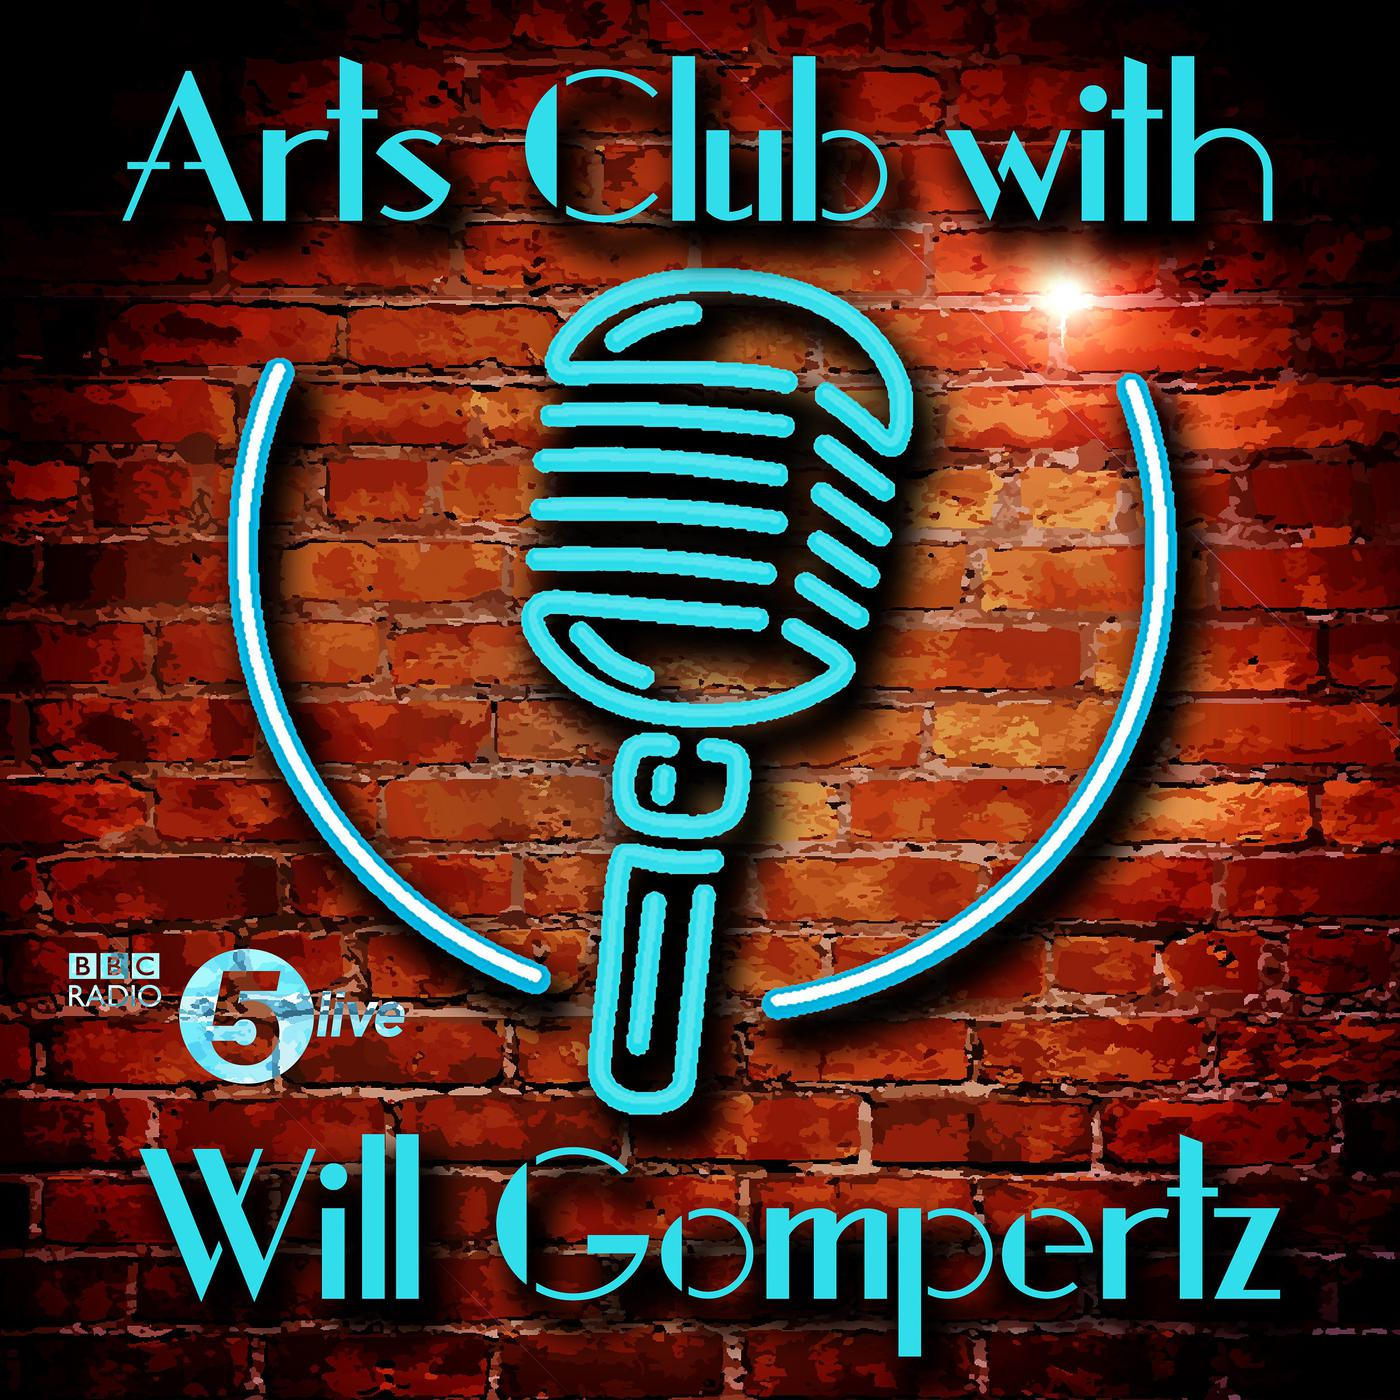 Arts Club with Will Gompertz (podcast) - BBC Radio 5 live